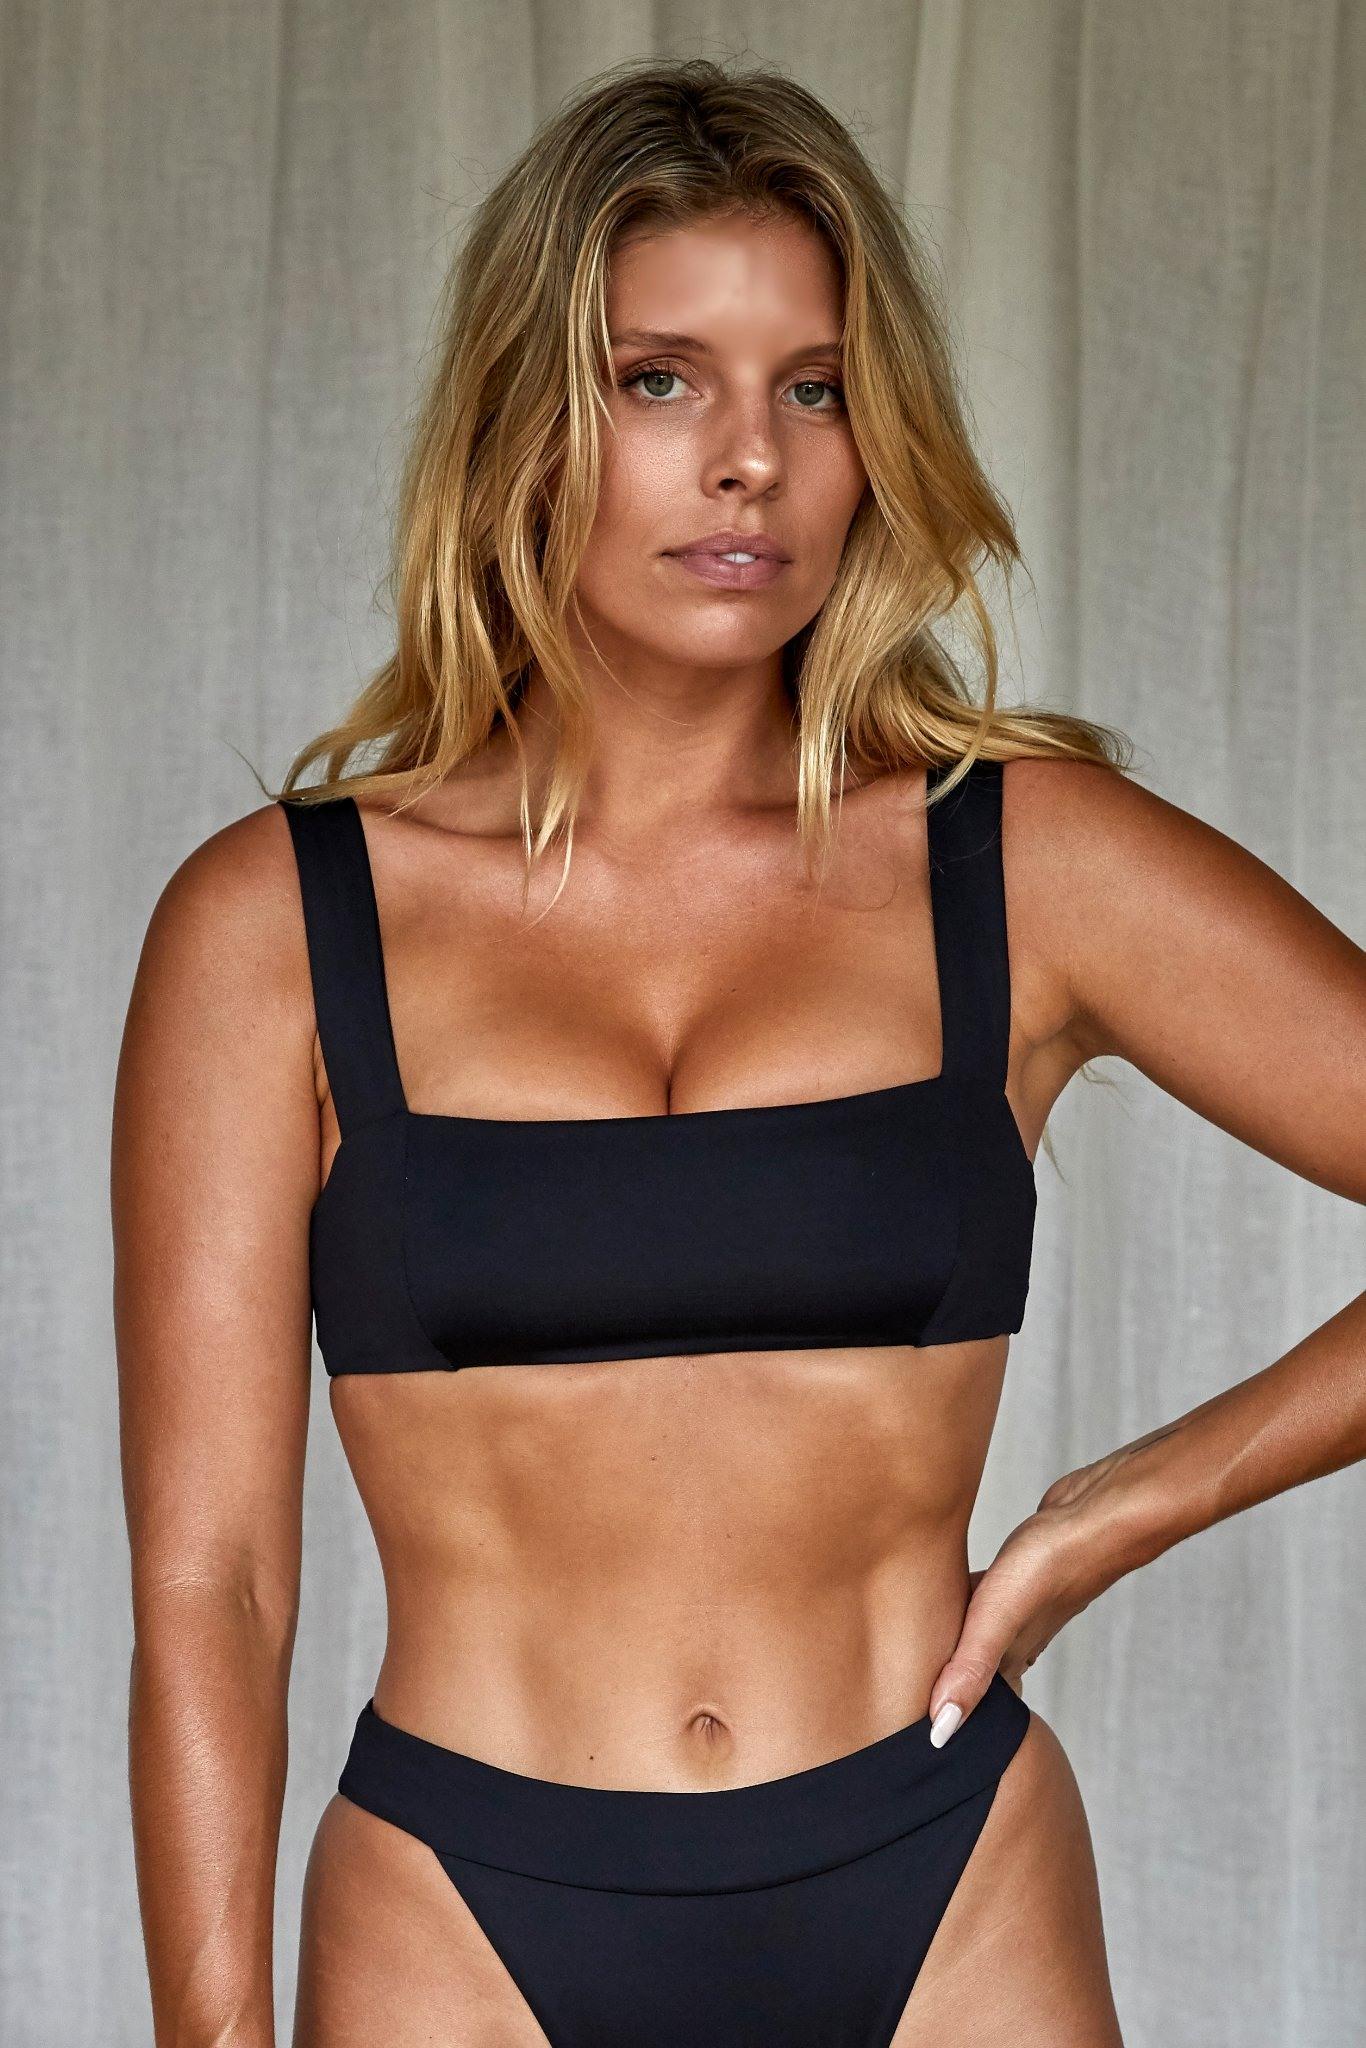 Puerto Rico Top by Monday Swimwear, available on mondayswimwear.com for $89 Natasha Oakley Top Exact Product